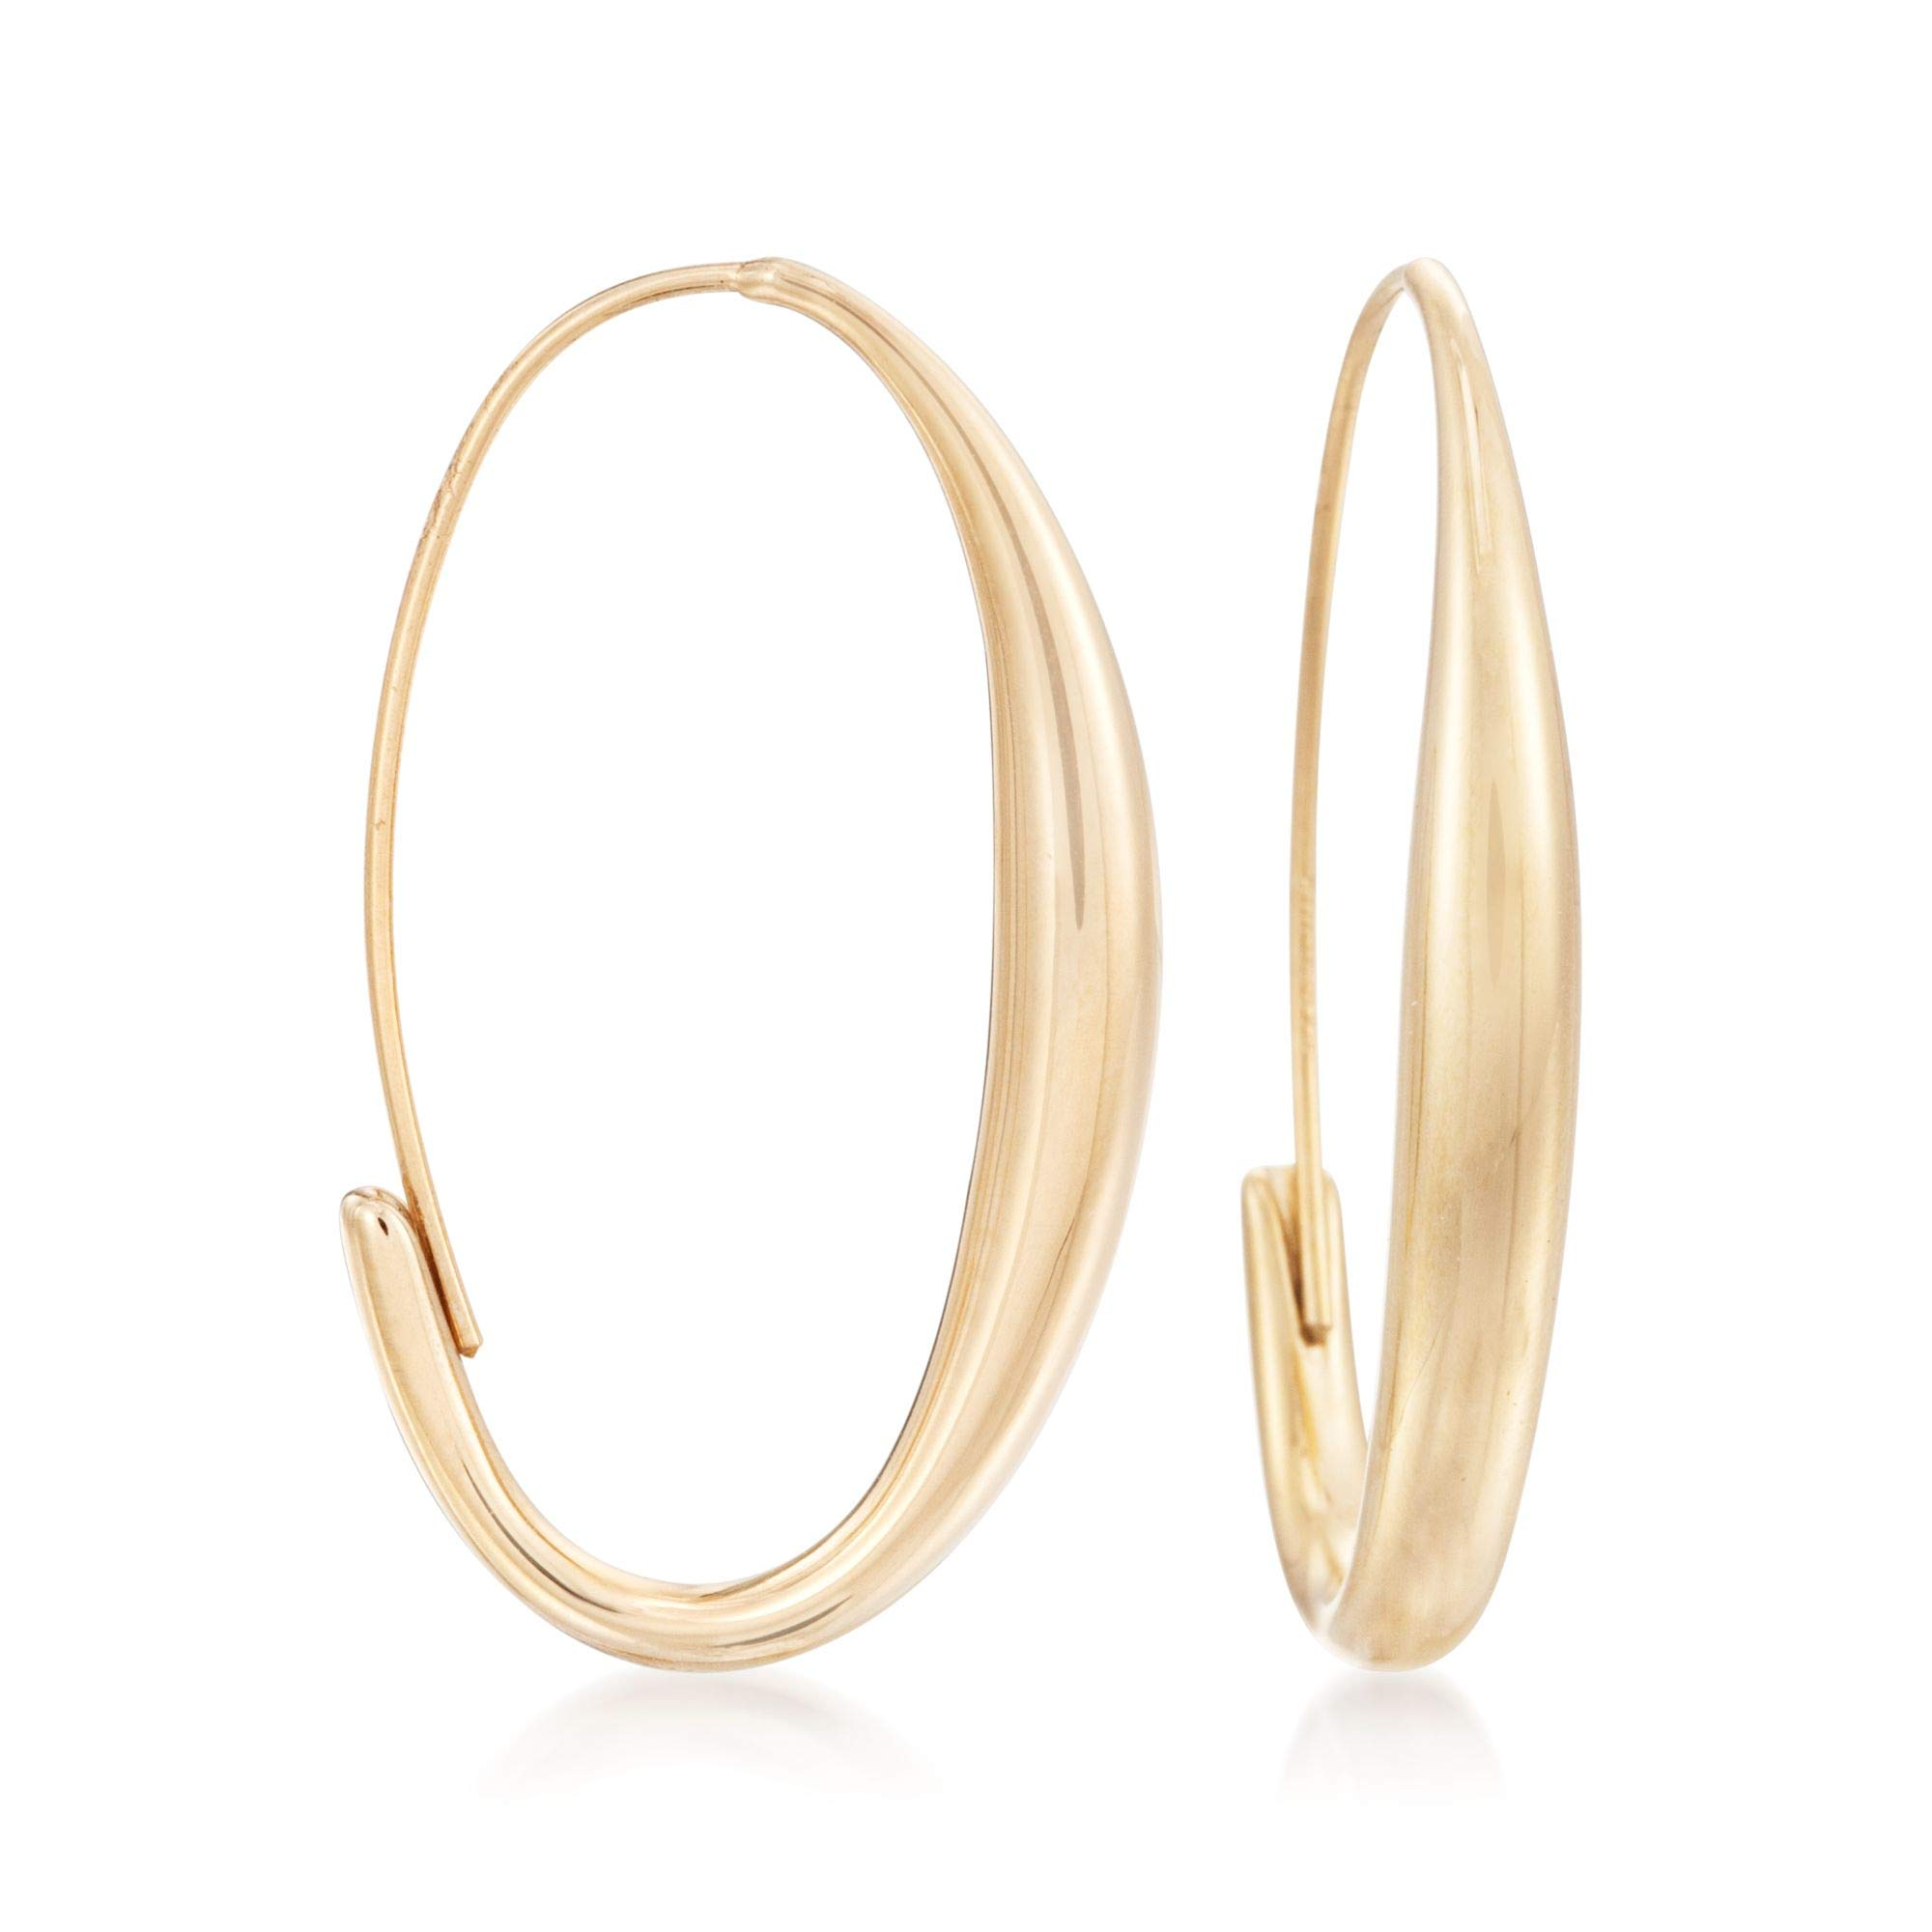 Ross-Simons 14kt Yellow Gold Oval Wire Hoop Earrings